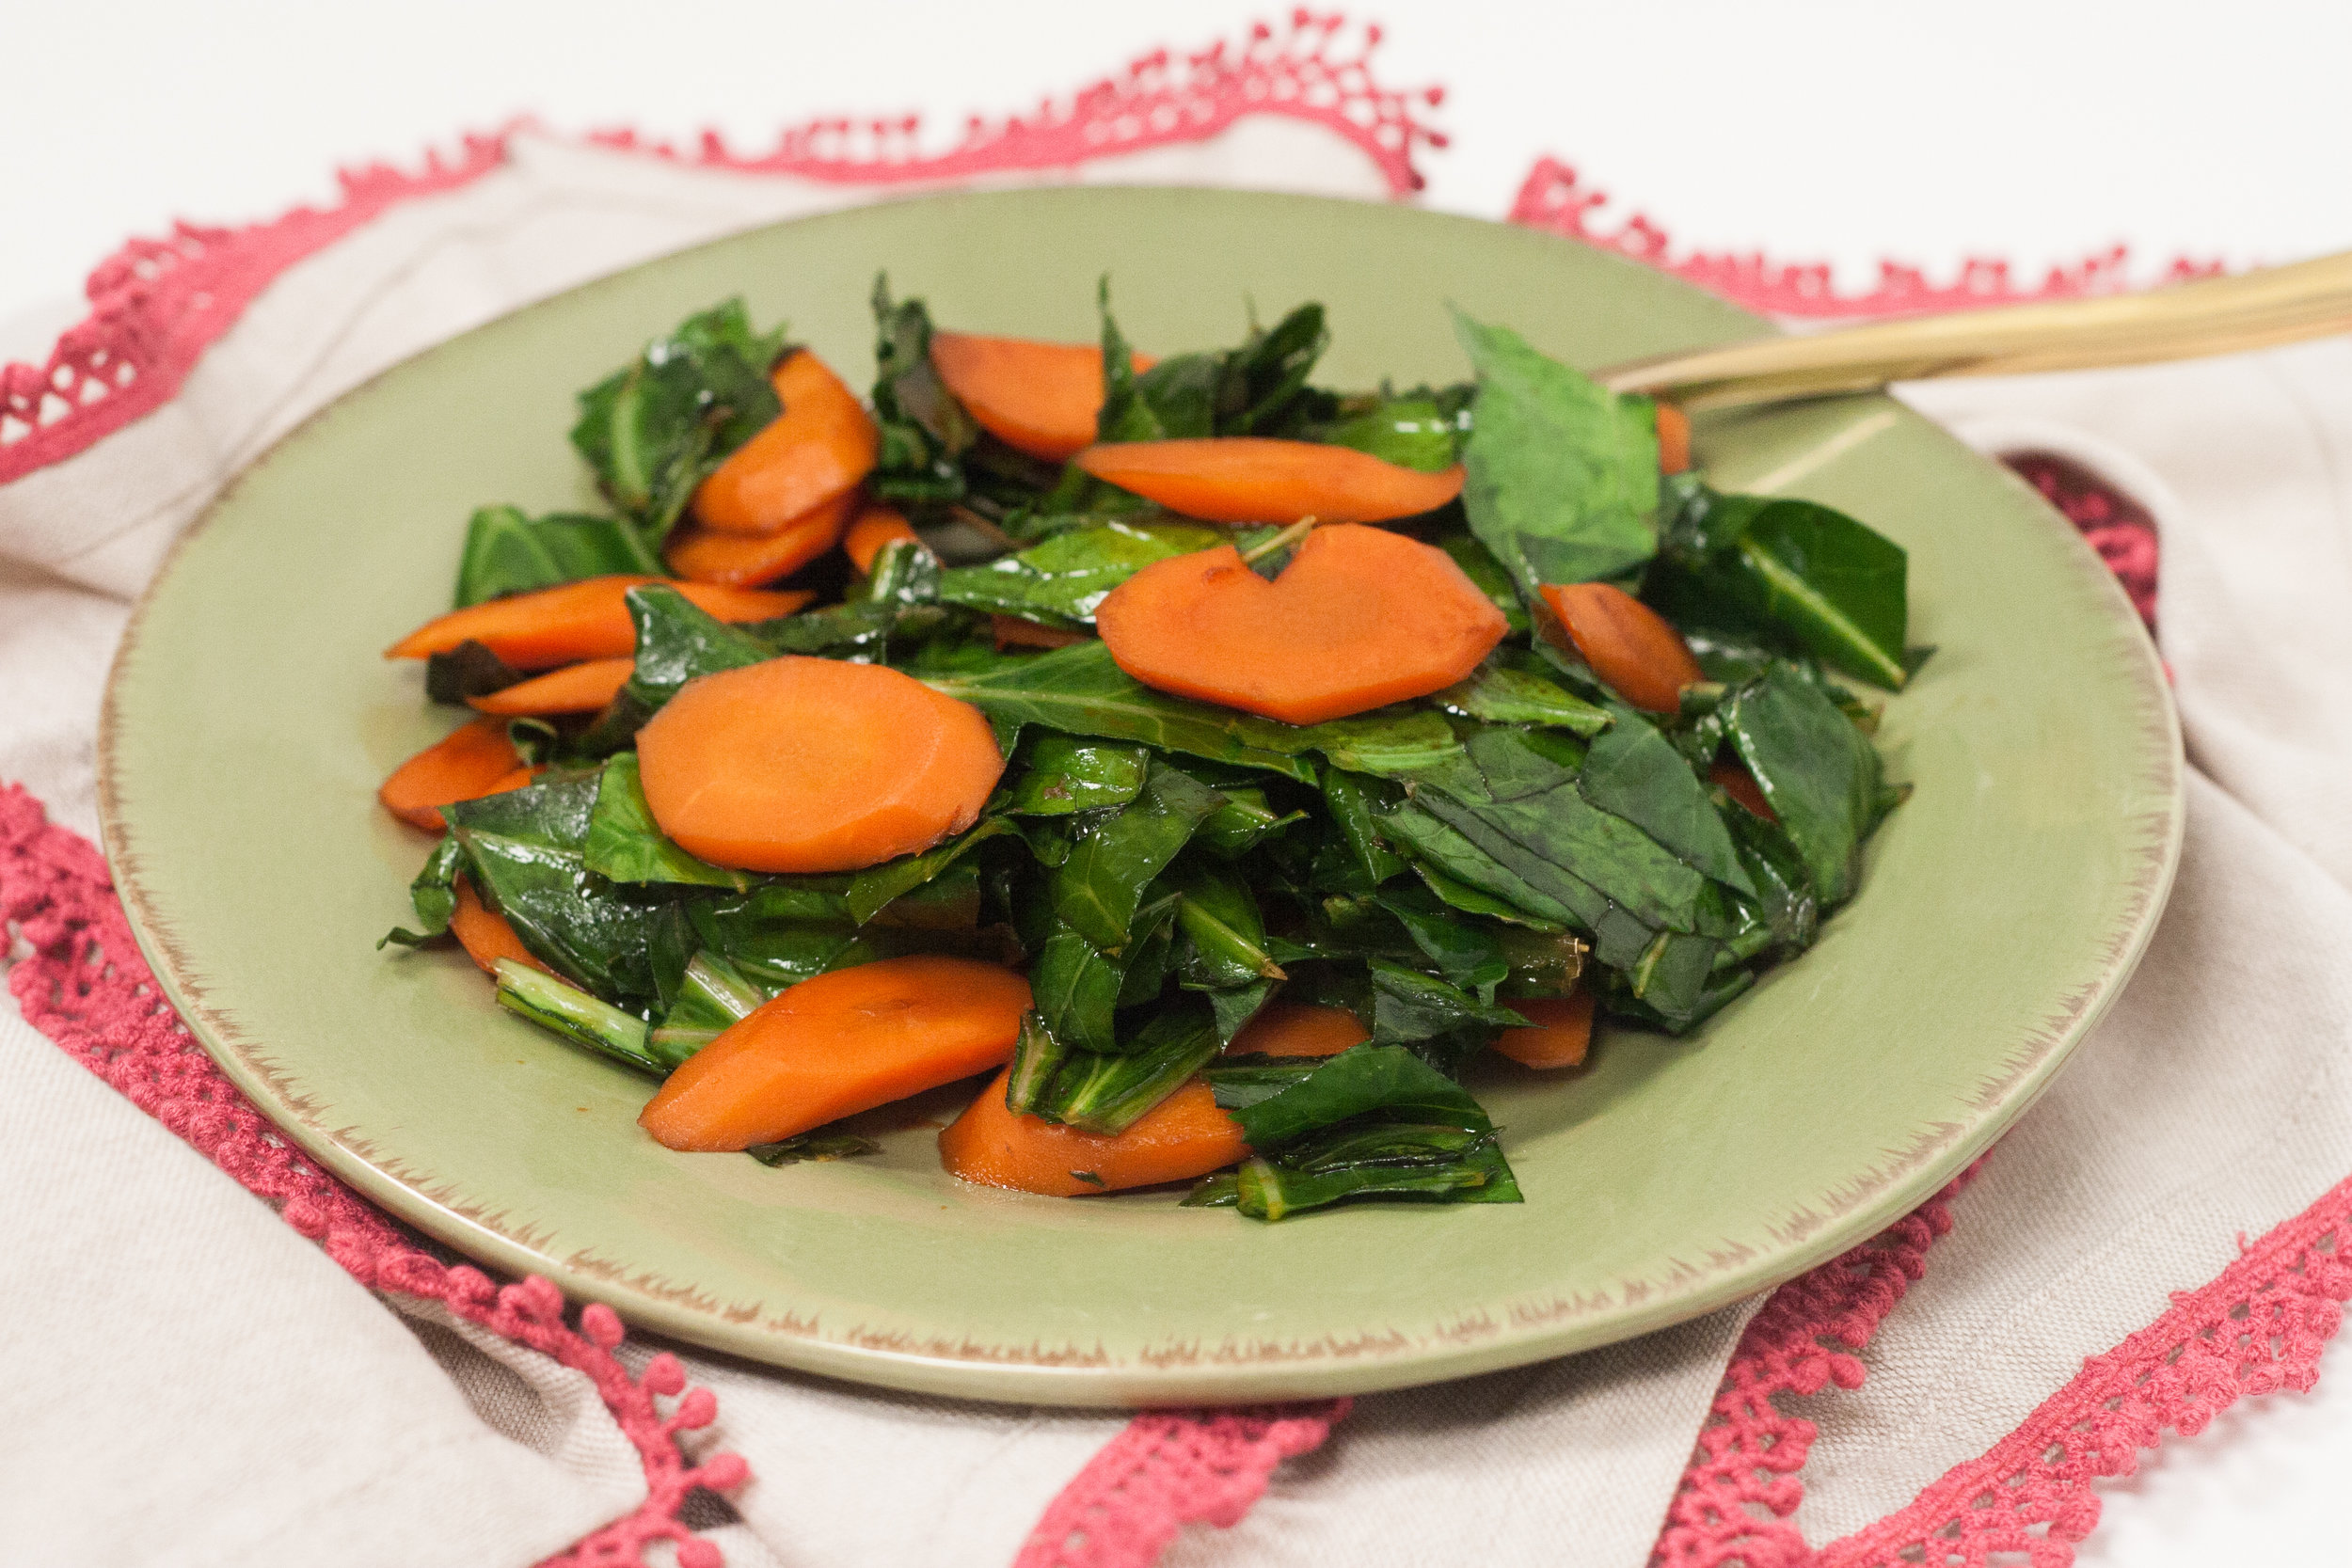 Low FODMAP vegetable recipe